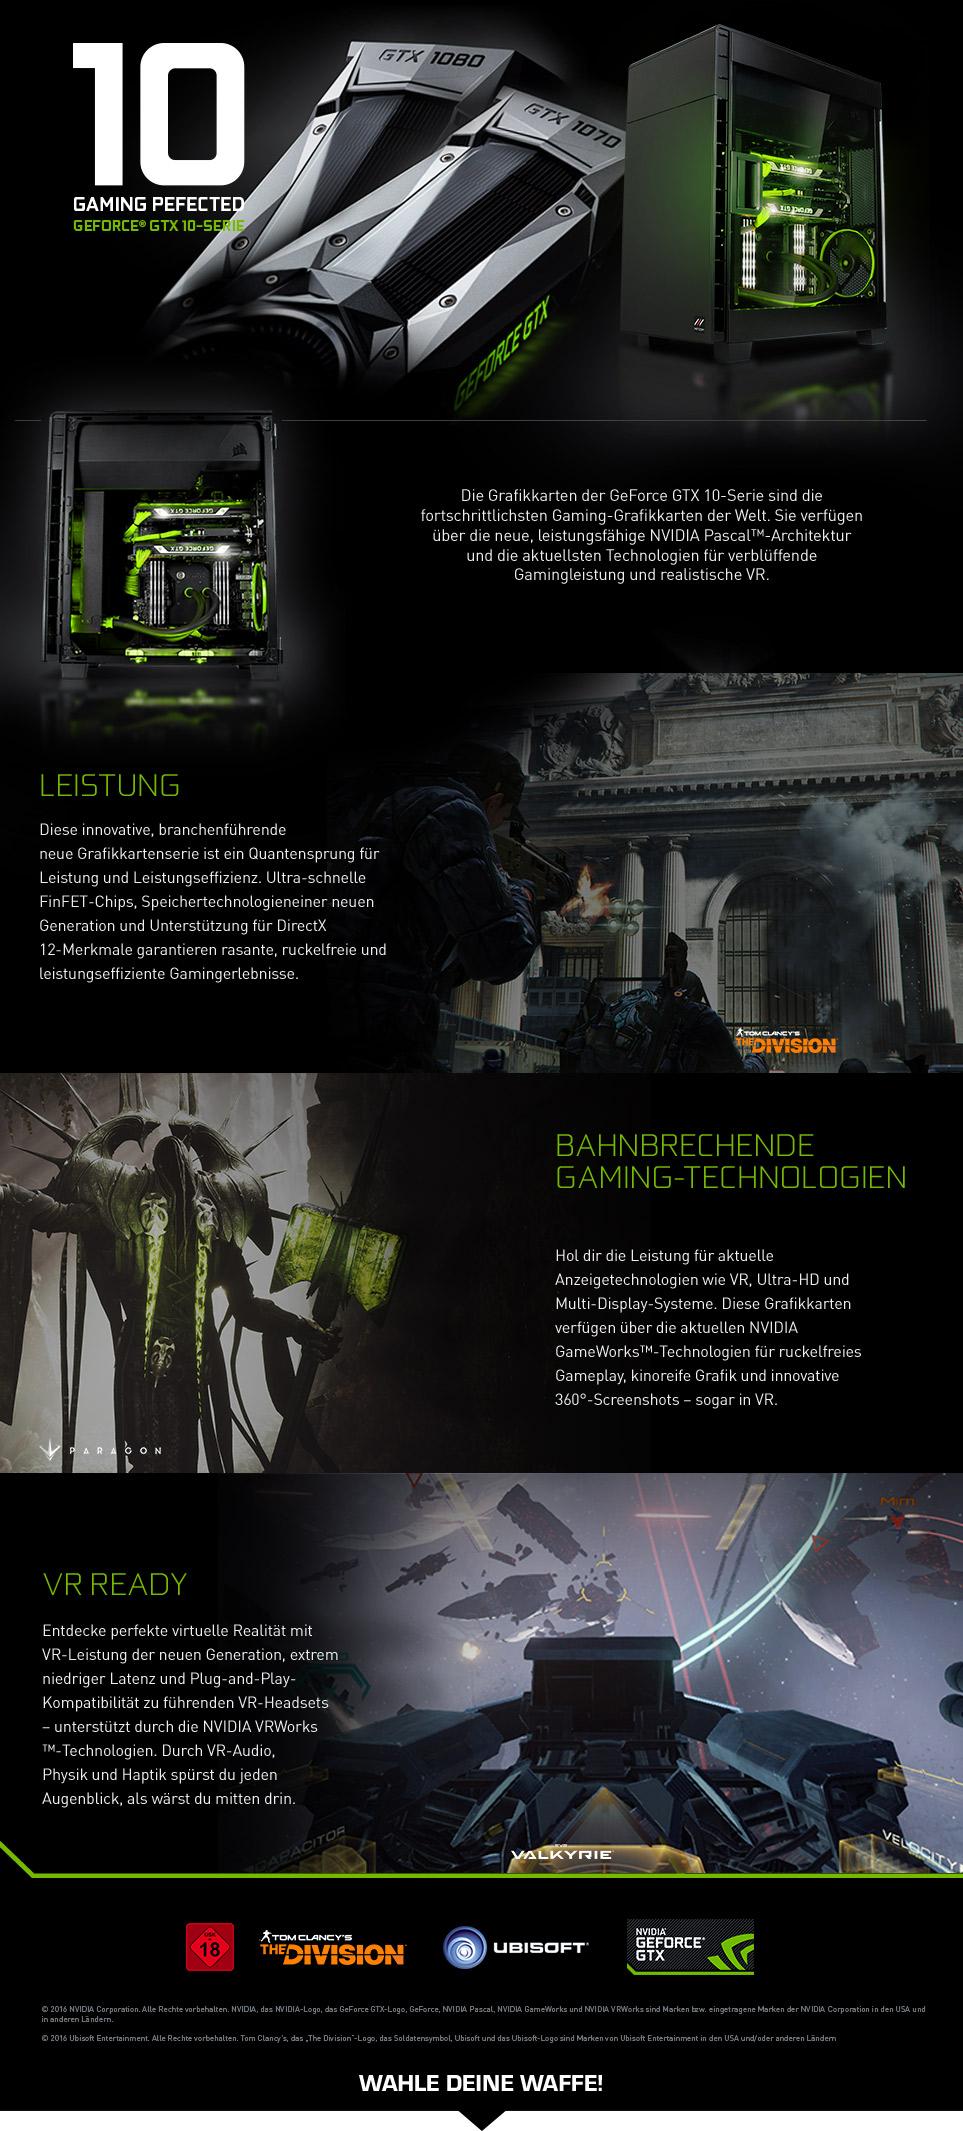 Gaming PC mit Nvidia GeForce GTX 1070 kaufen | MIFCOM